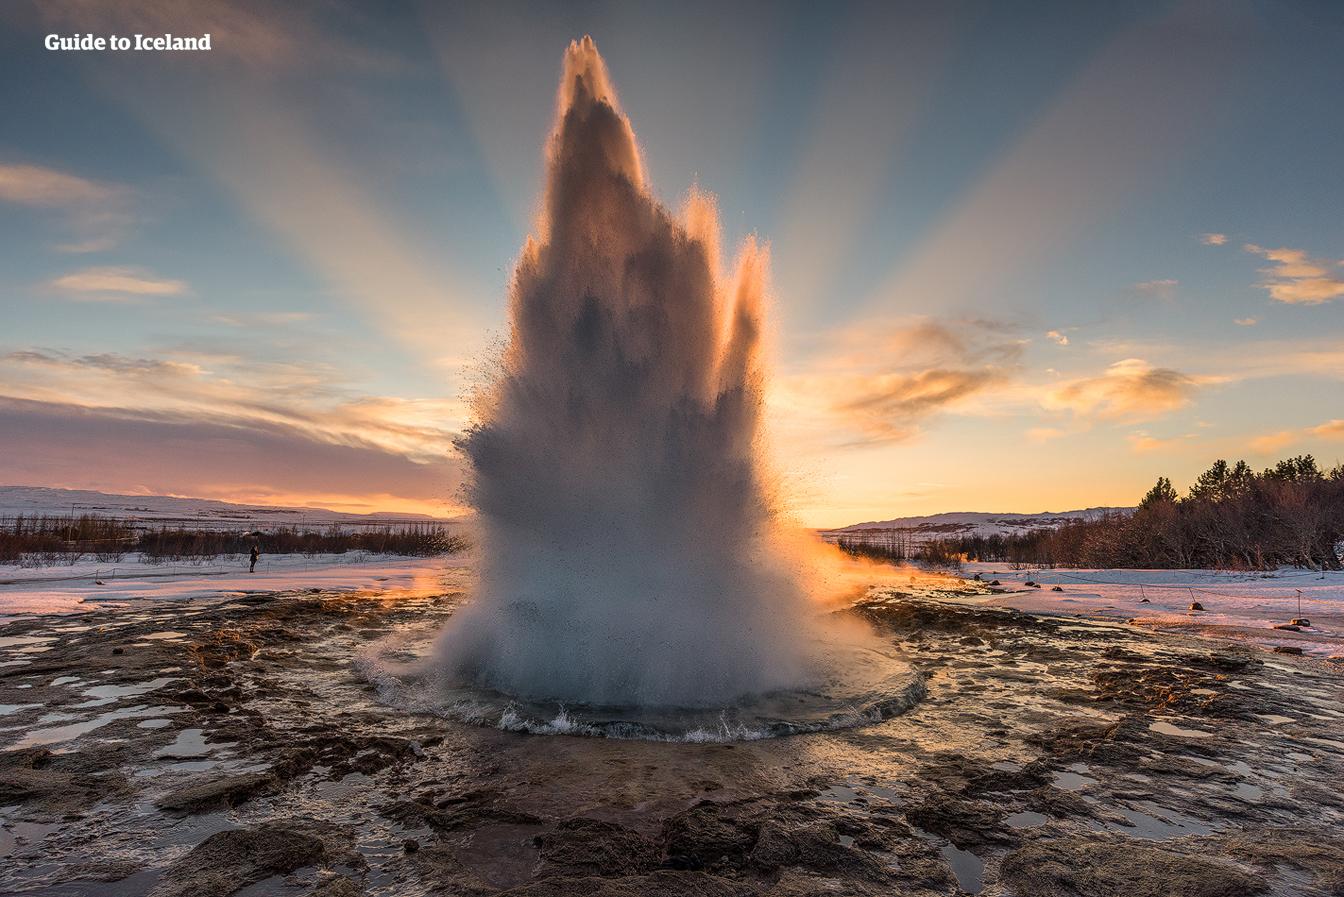 Scenic 5 Day Road Trip Adventure Through Iceland's South Coast, Landmannalaugar & Highlands - day 4